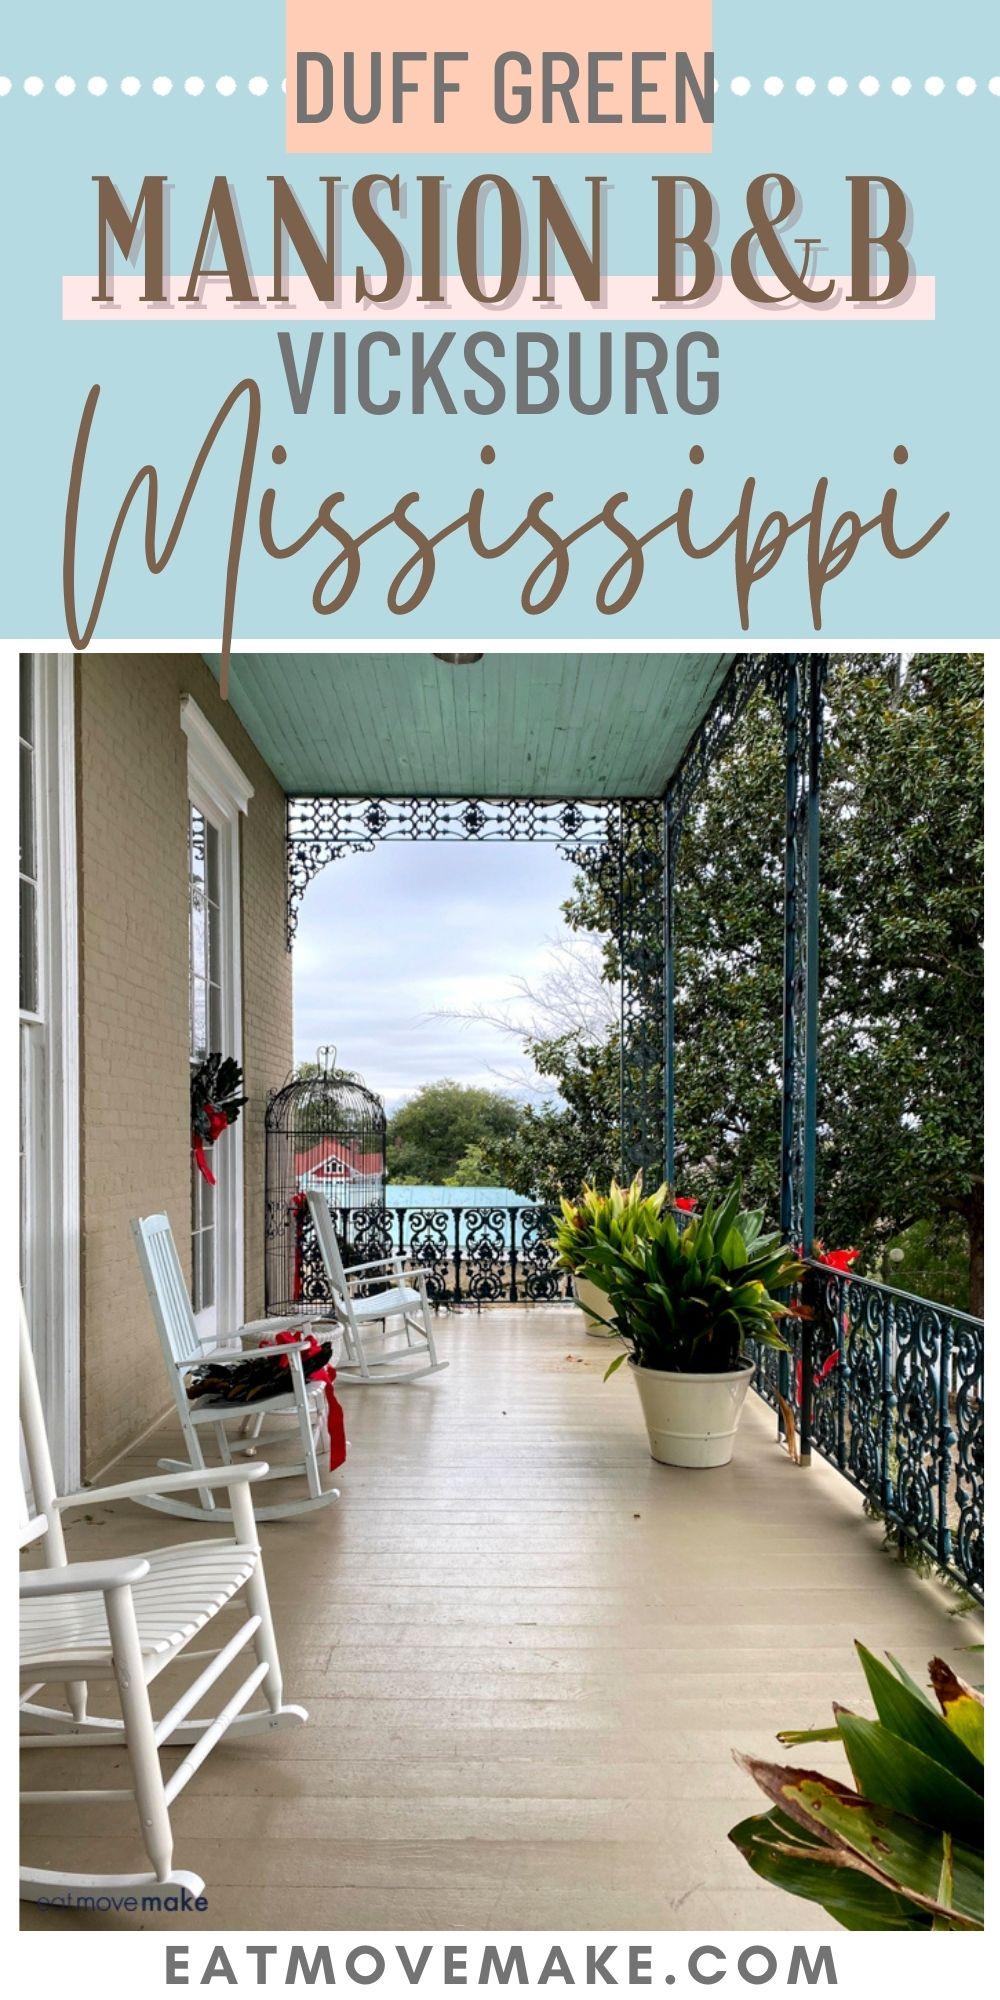 Duff Green Mansion B&B - Vicksburg, MS